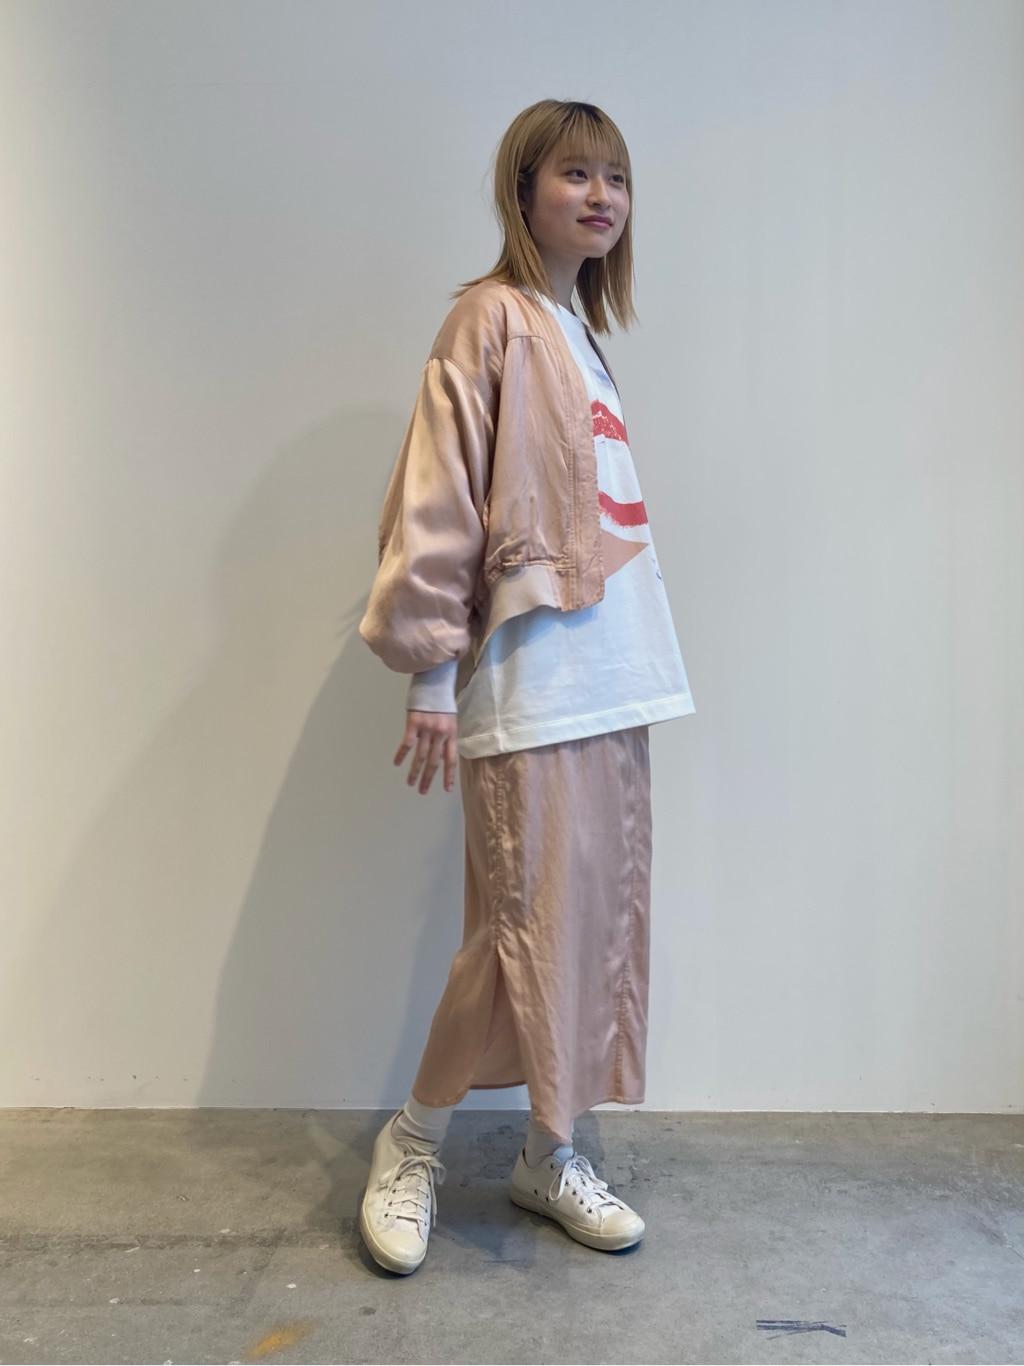 FLAT AMB 名古屋栄路面 2021.03.02